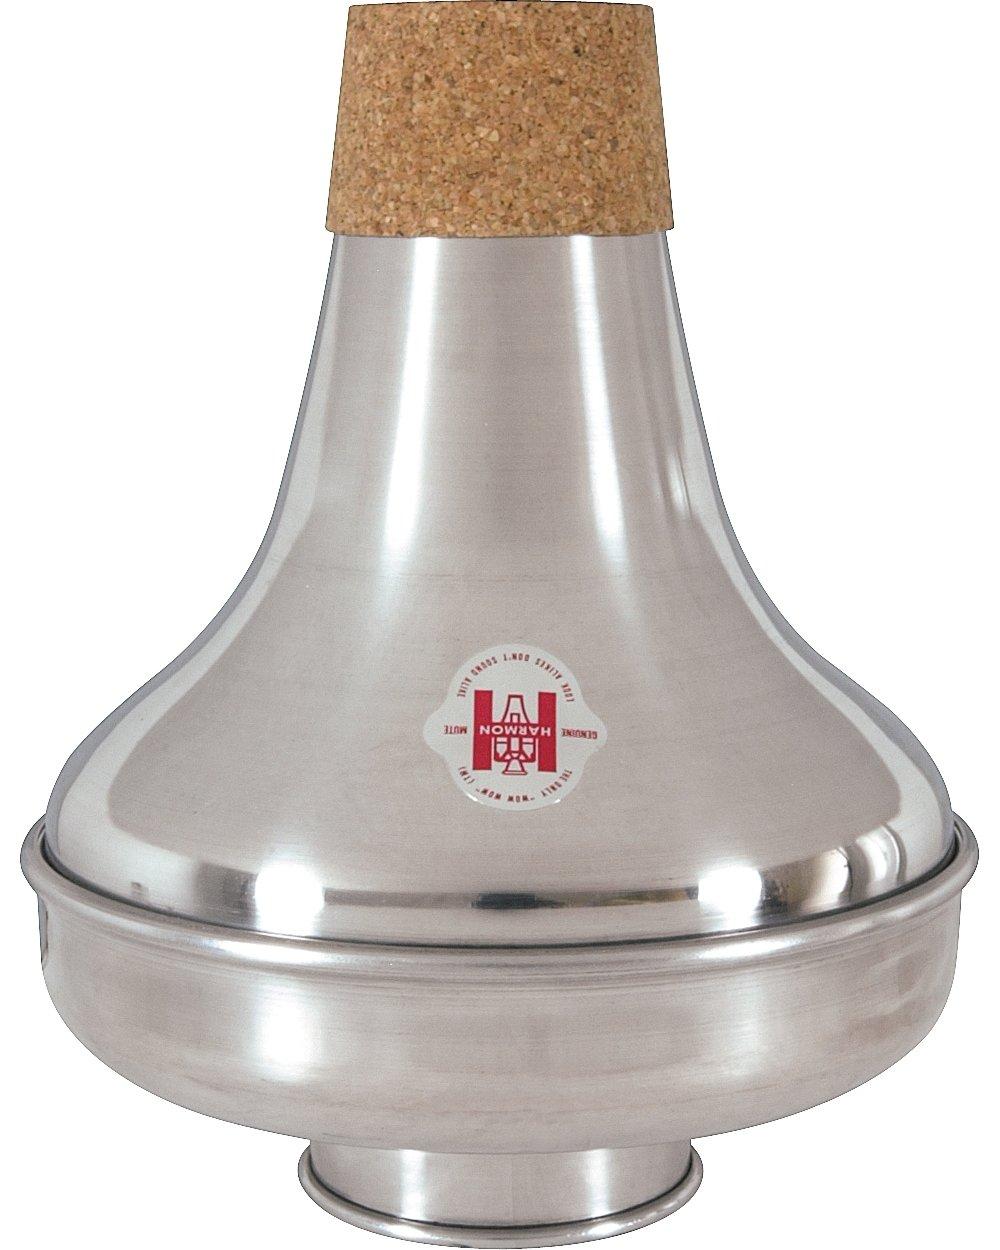 Harmon E Model Aluminum Trombone Wow-Wow Mute